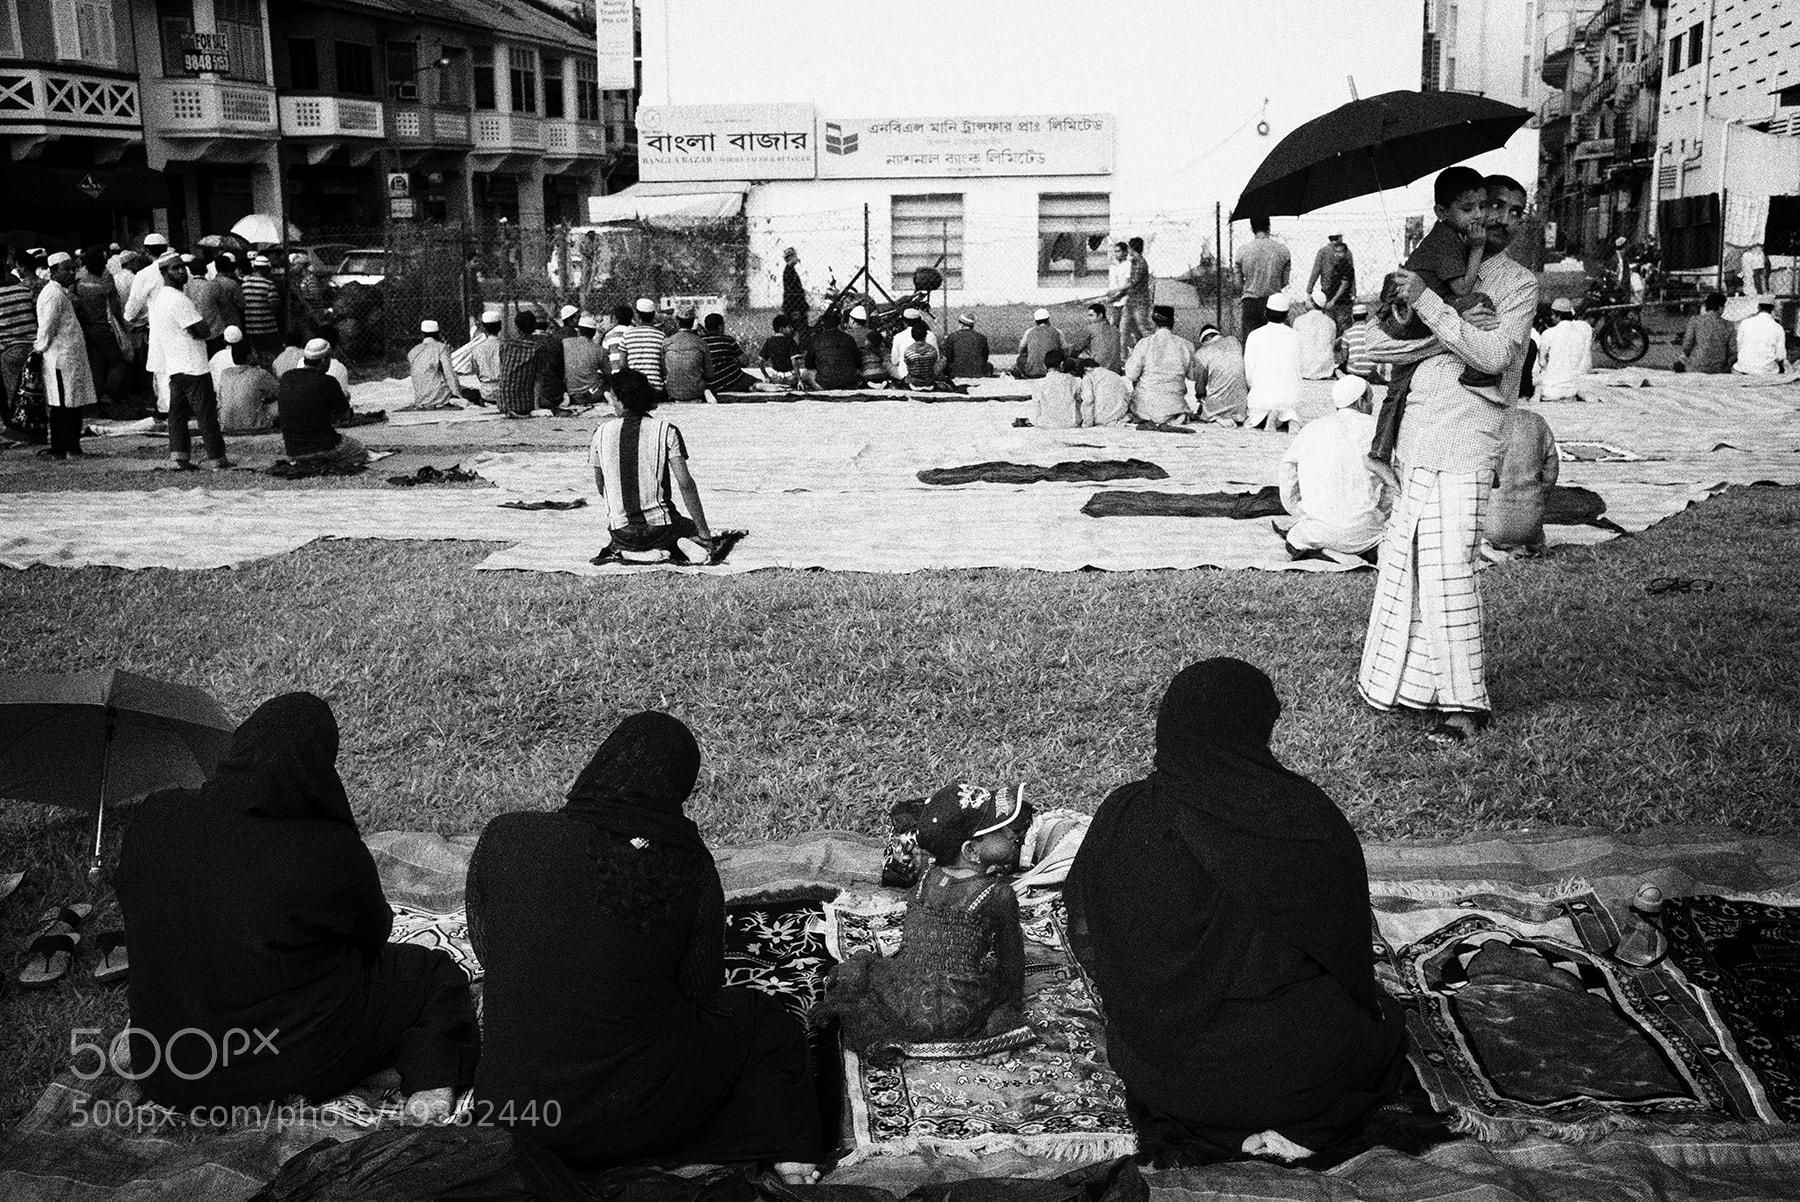 Photograph haj, 2013 by  momofuku on 500px